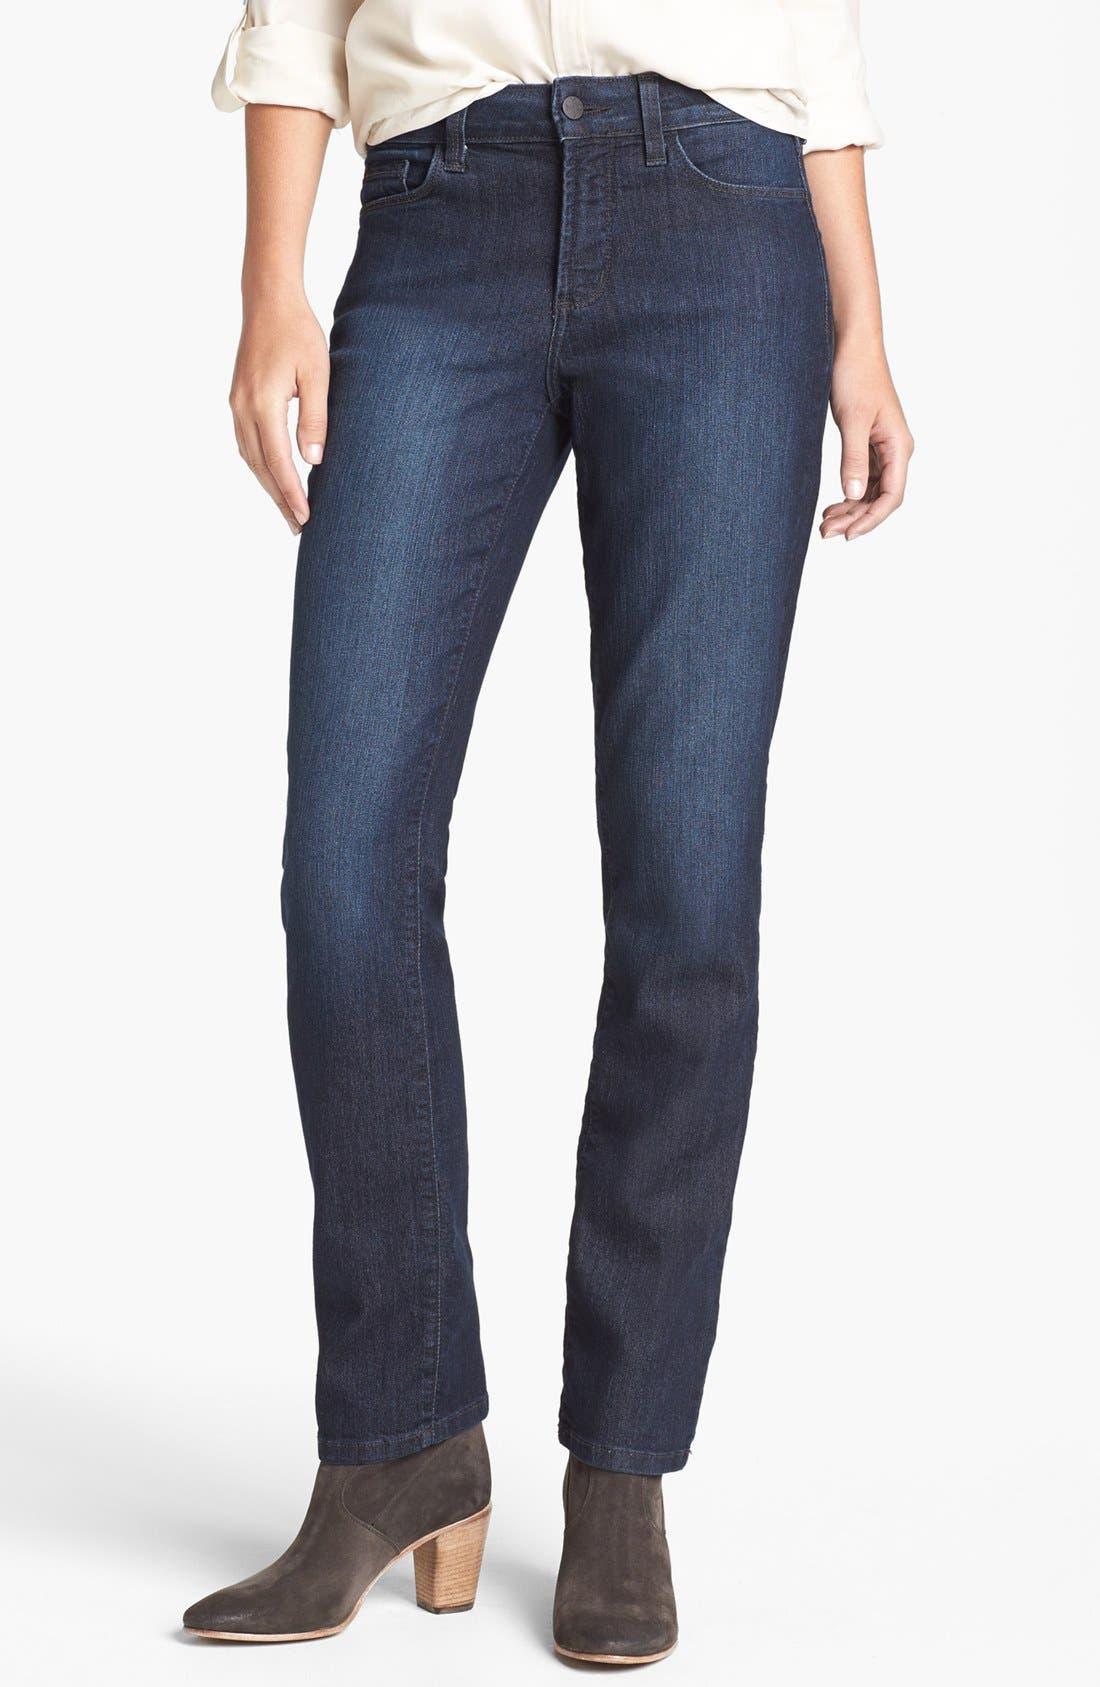 Main Image - NYDJ 'Sheri' Embellished Pocket Stretch Skinny Jeans